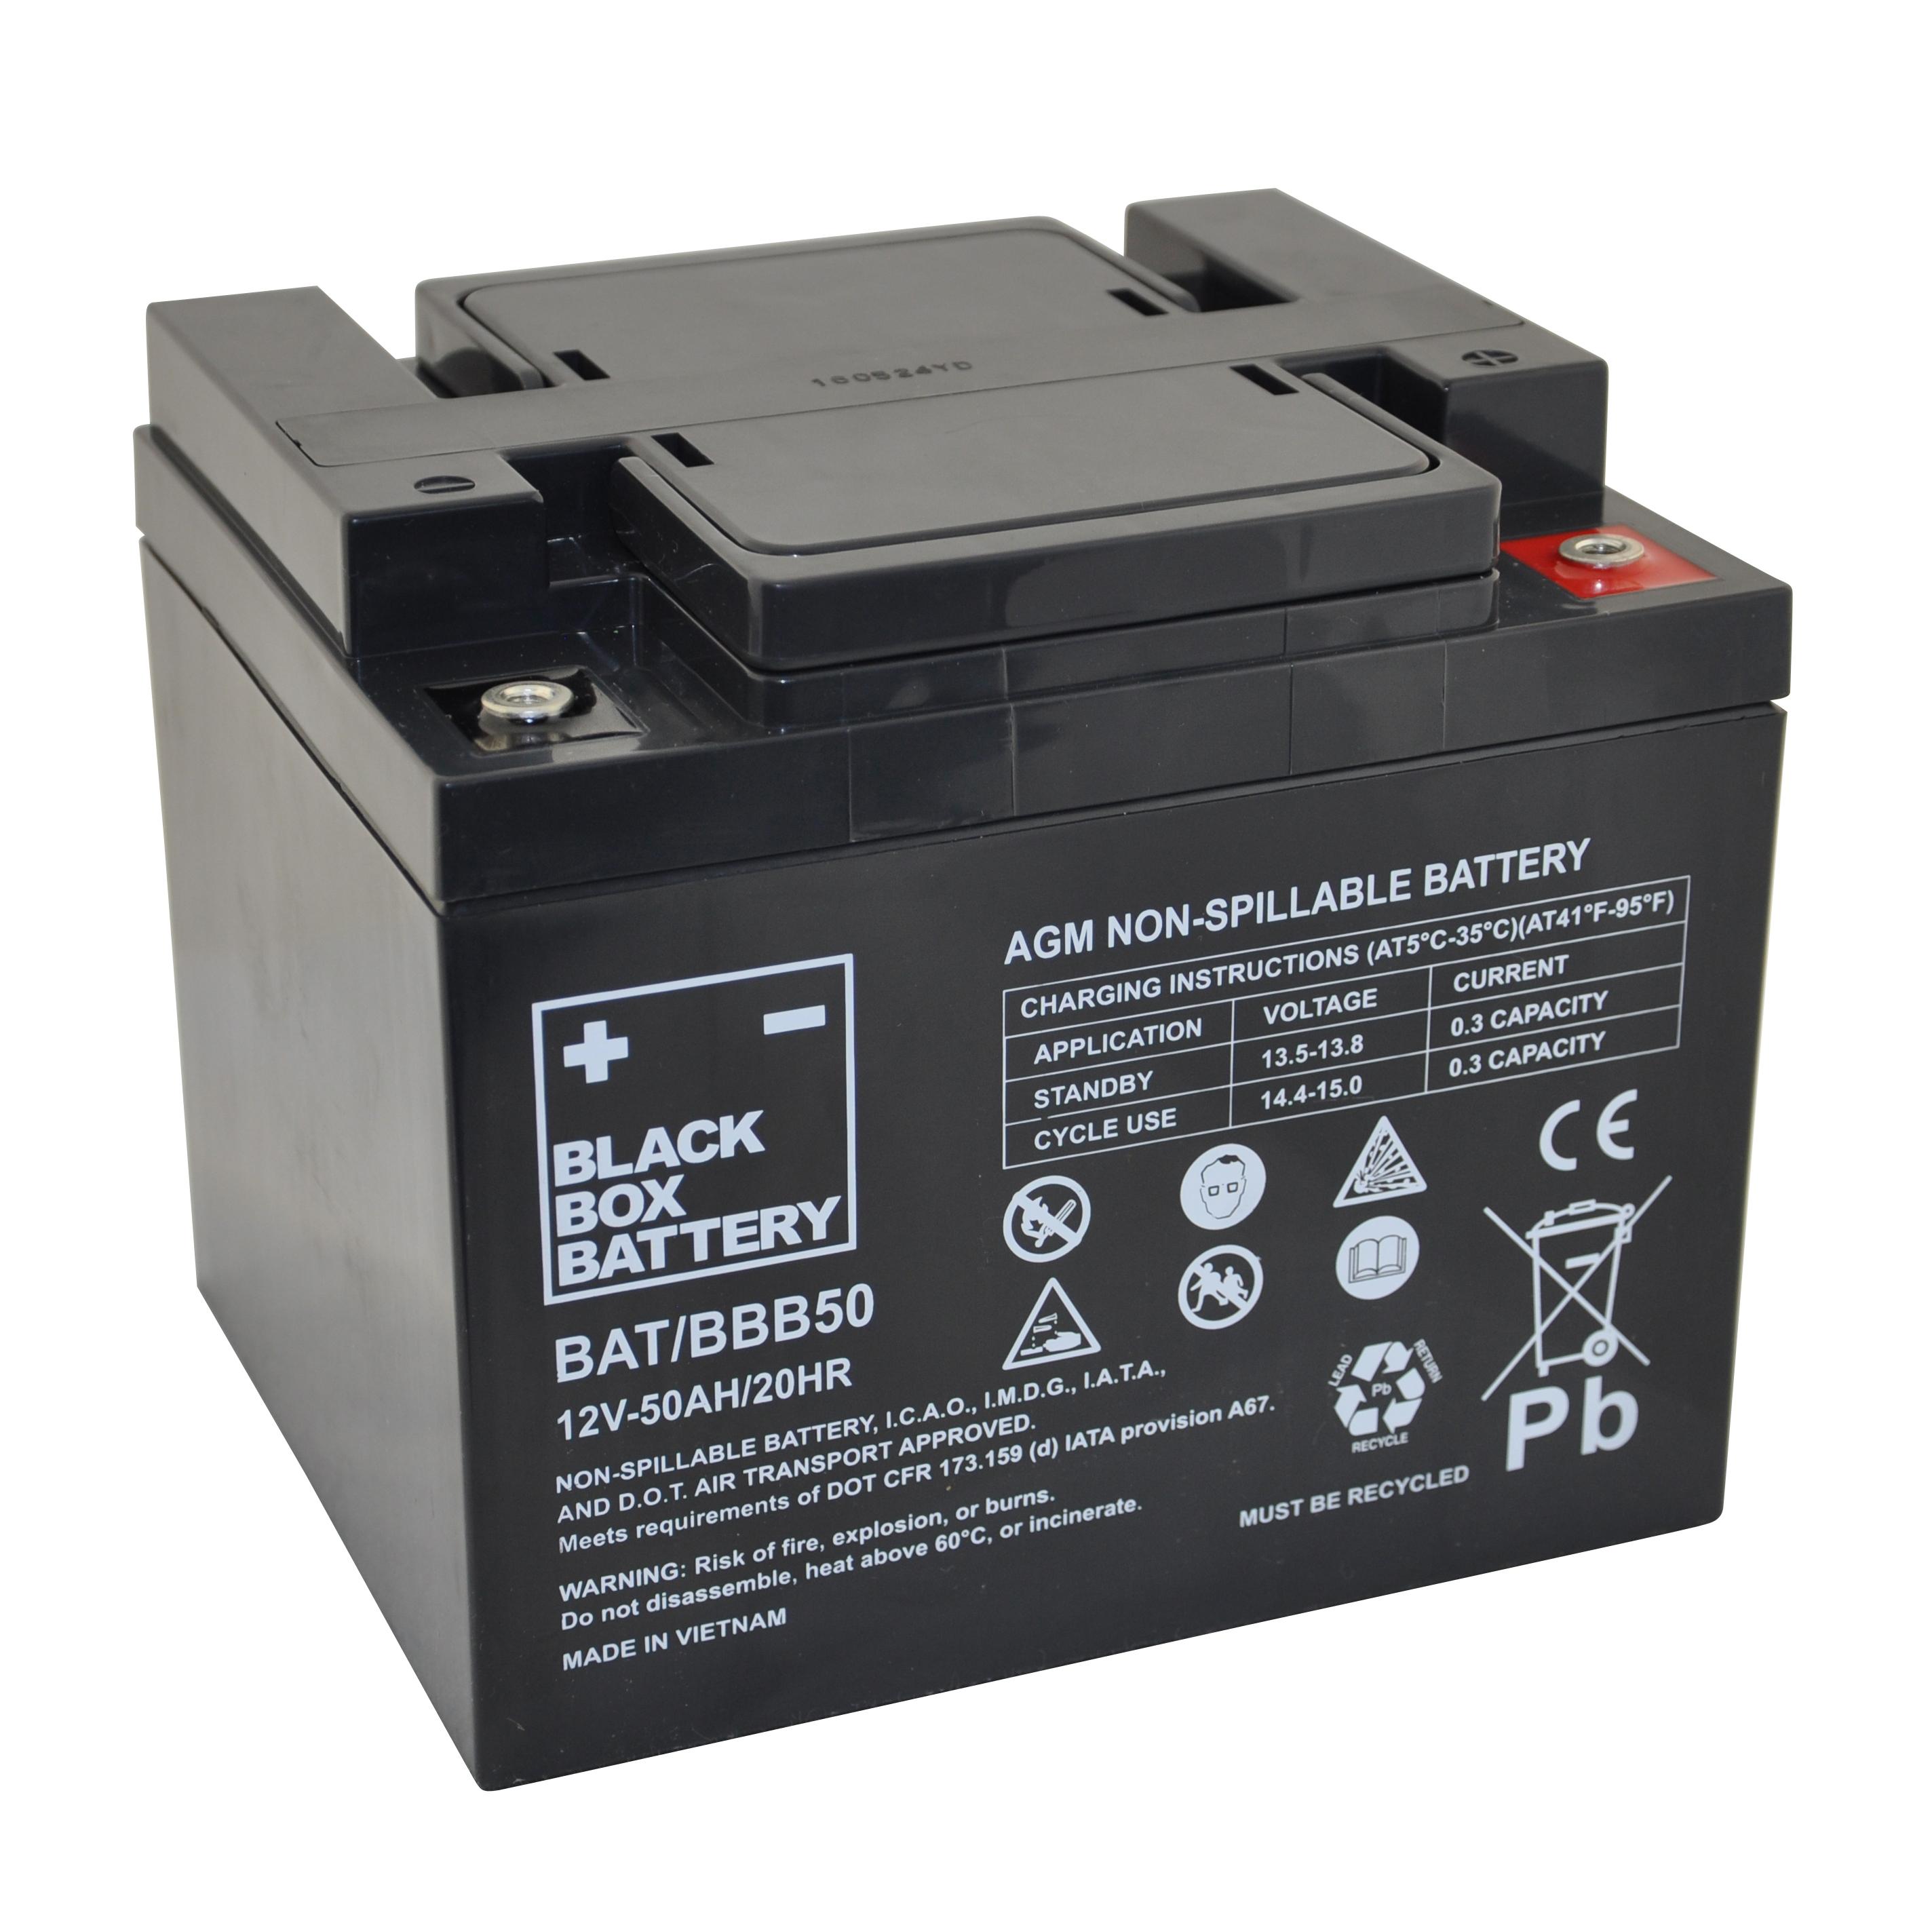 50ah black box agm battery flexel mobility. Black Bedroom Furniture Sets. Home Design Ideas